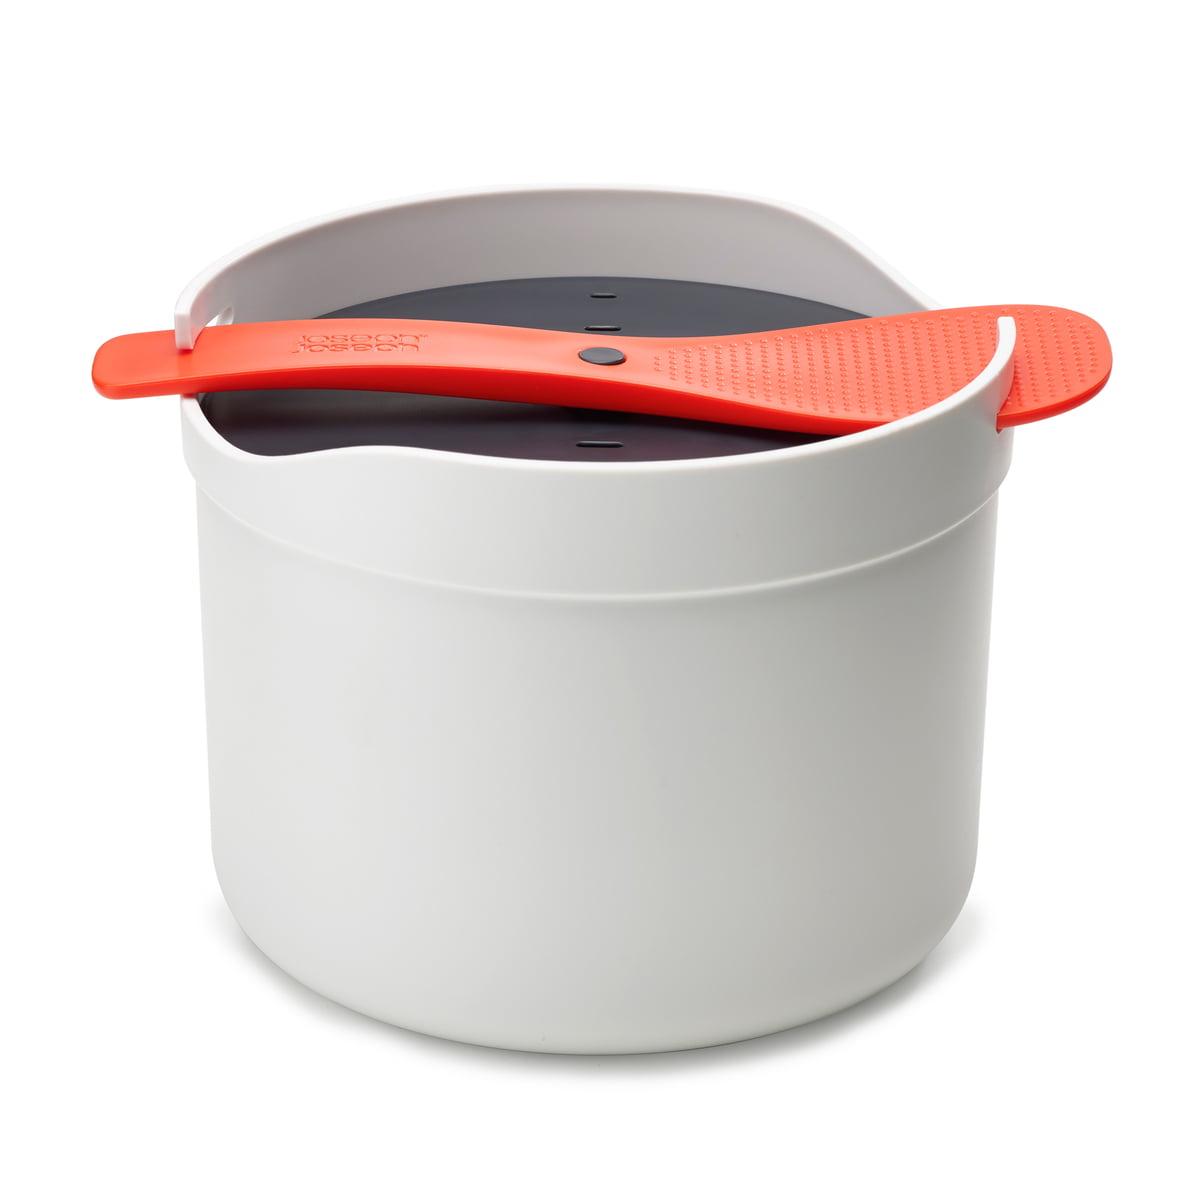 Joseph Joseph - M-Cuisine Mikrowellen-Reiskocher | Küche und Esszimmer > Küchenelektrogeräte > Mikrowellen | Joseph Joseph